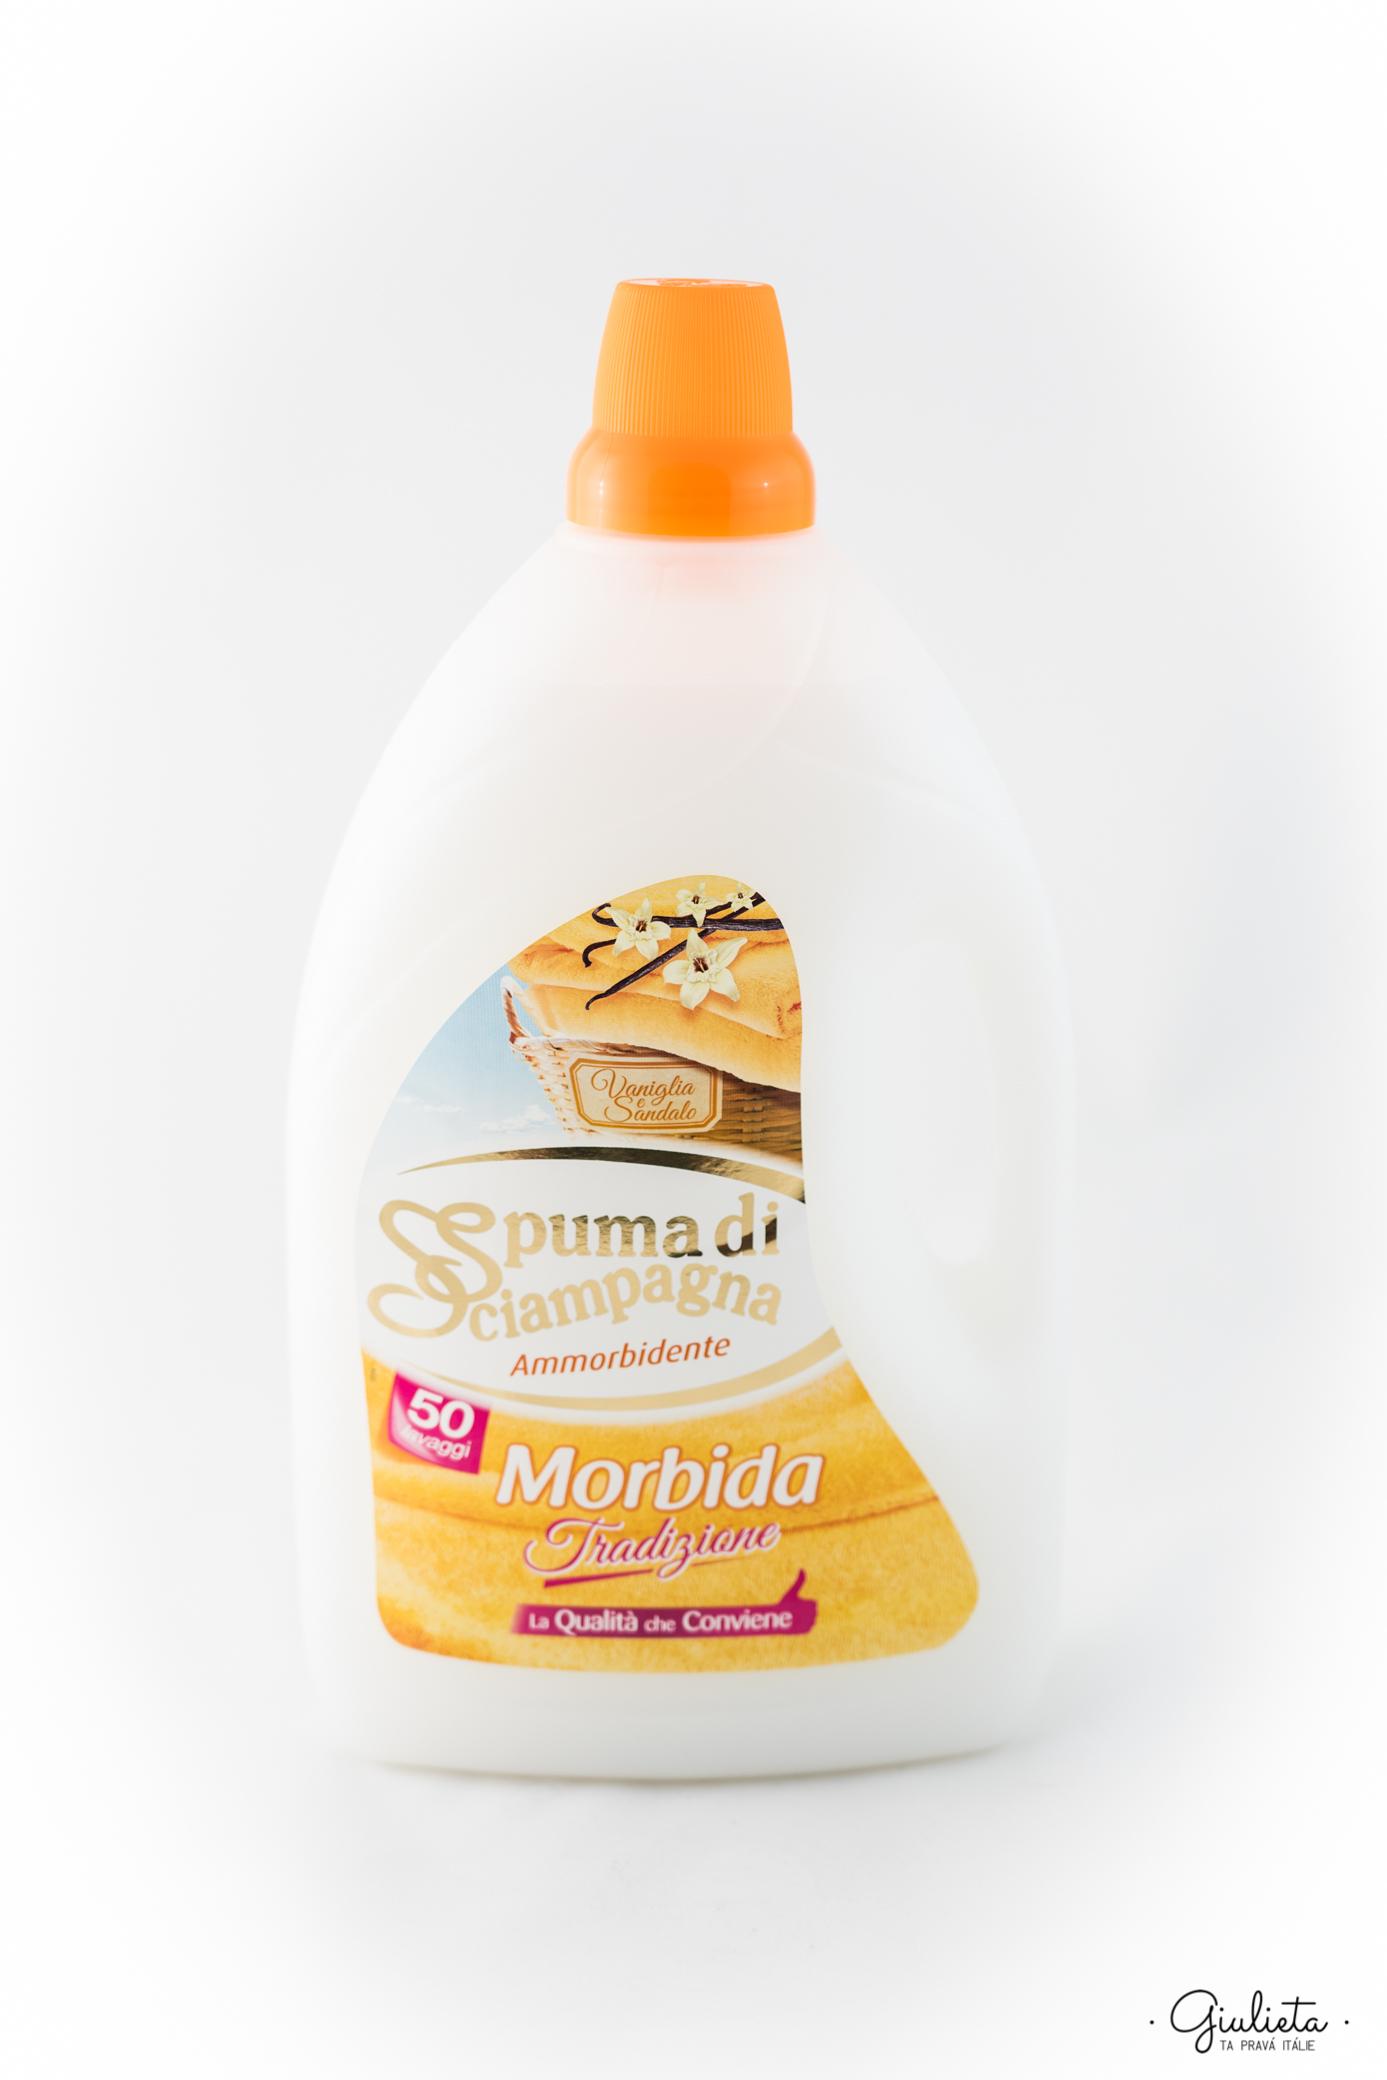 Spuma di Sciampagna aviváž Morbida s vůní vanilky & santalového dřeva, 50 pracích dávek